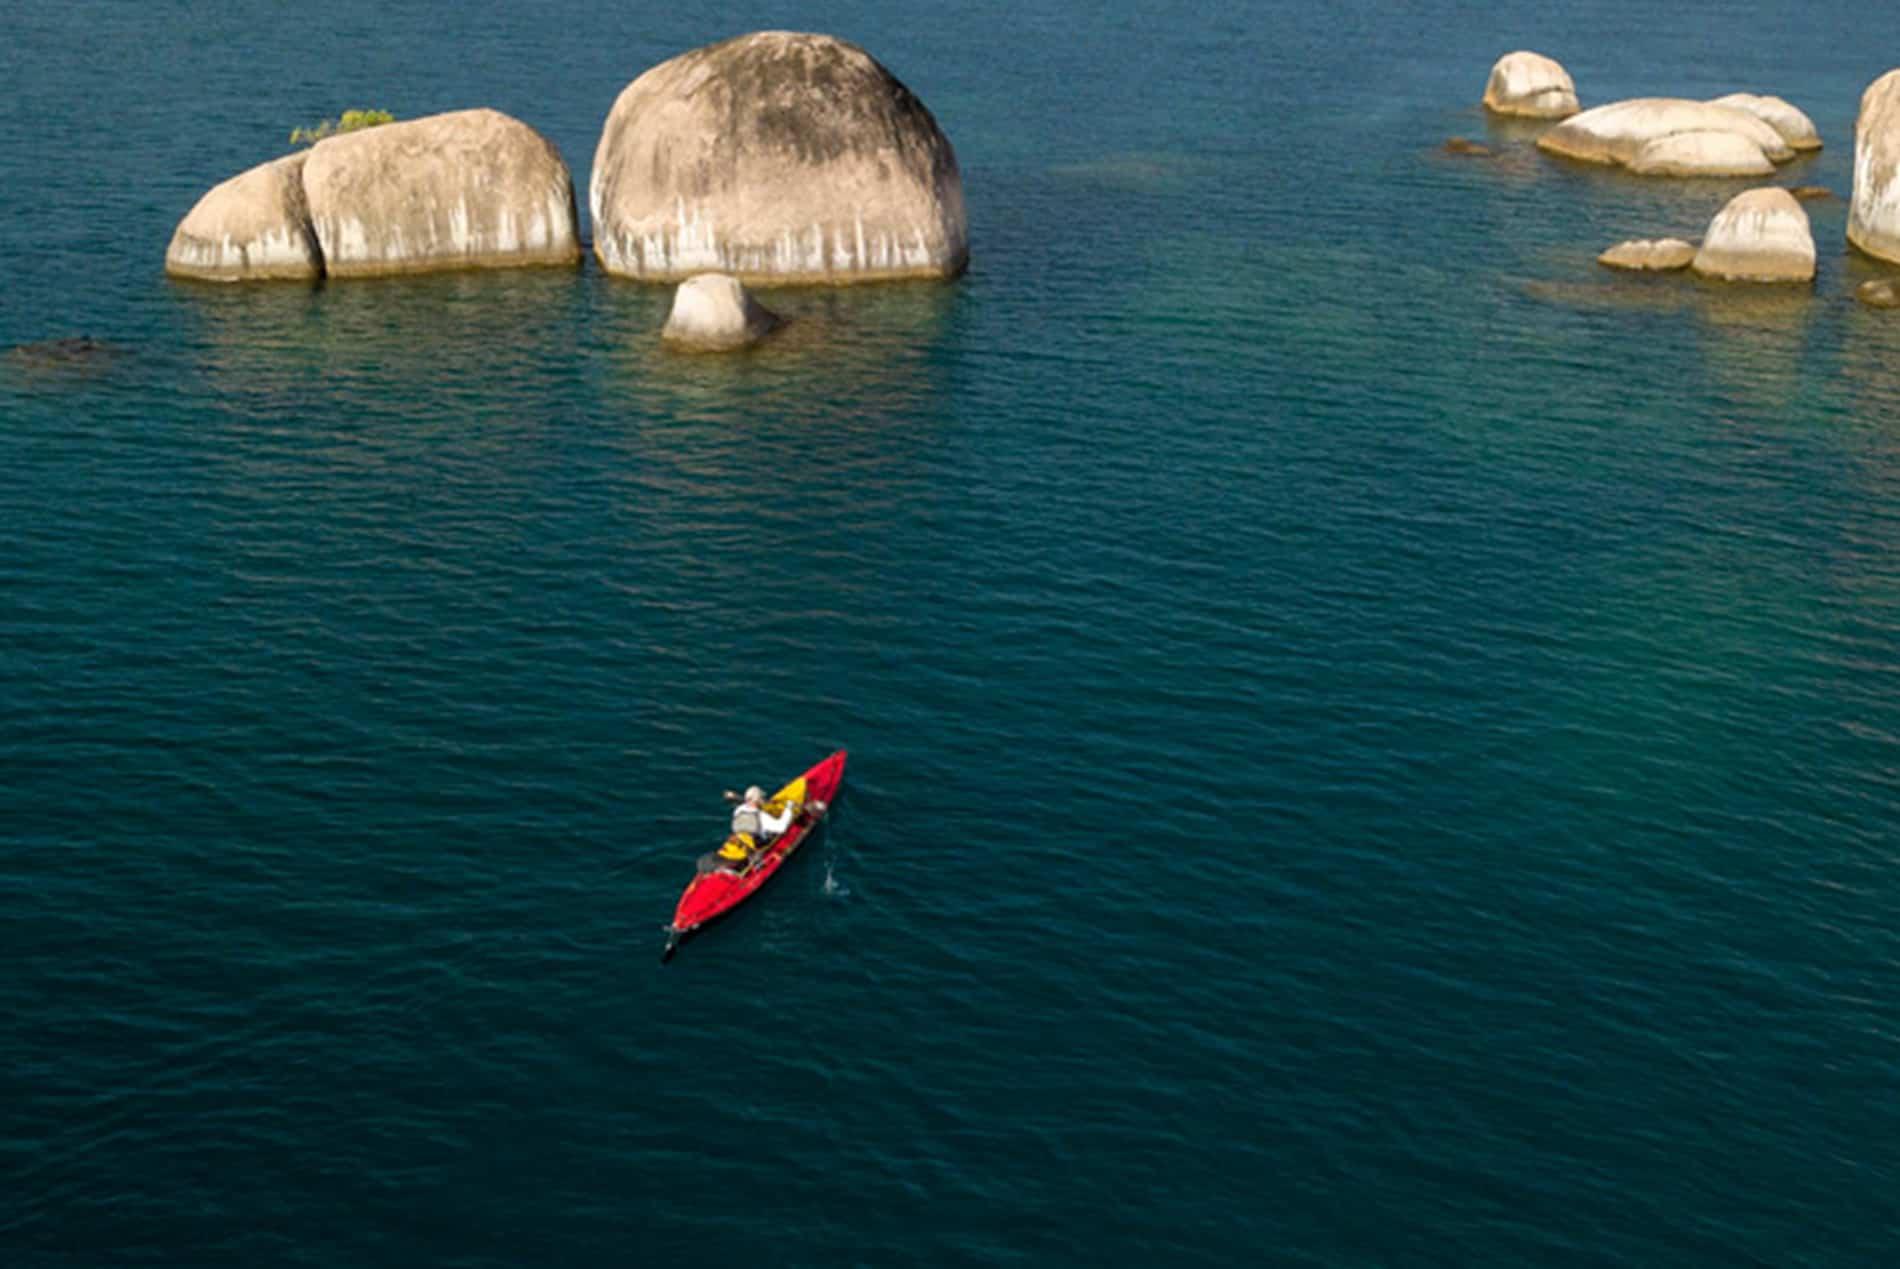 Ross Exler Paddles Africa's Great Lakes